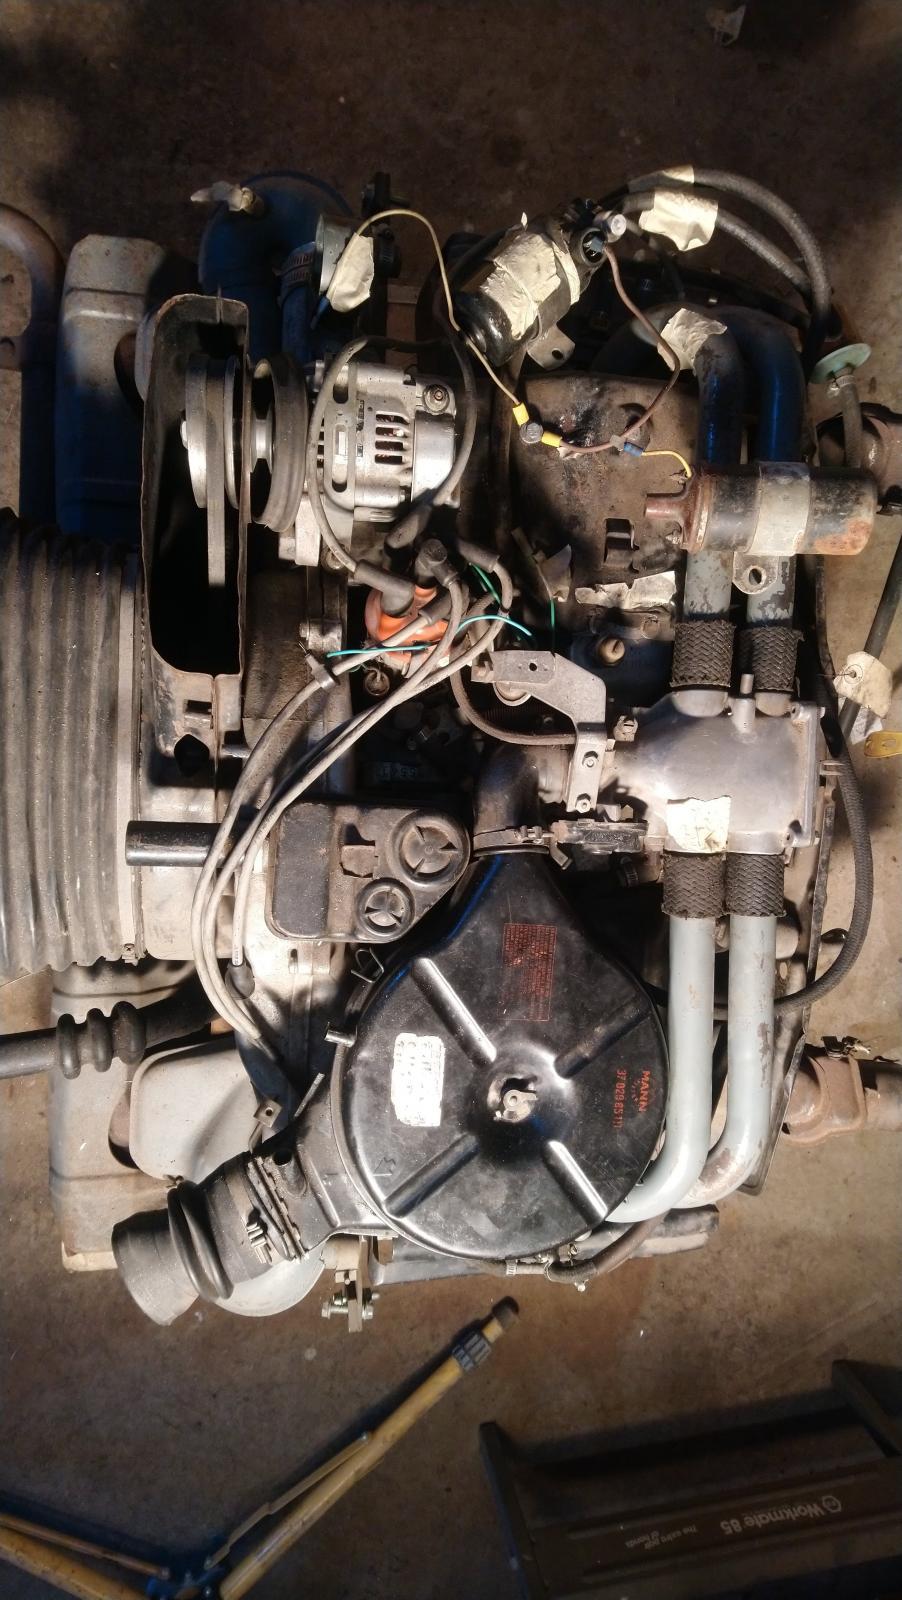 Type 3 engine